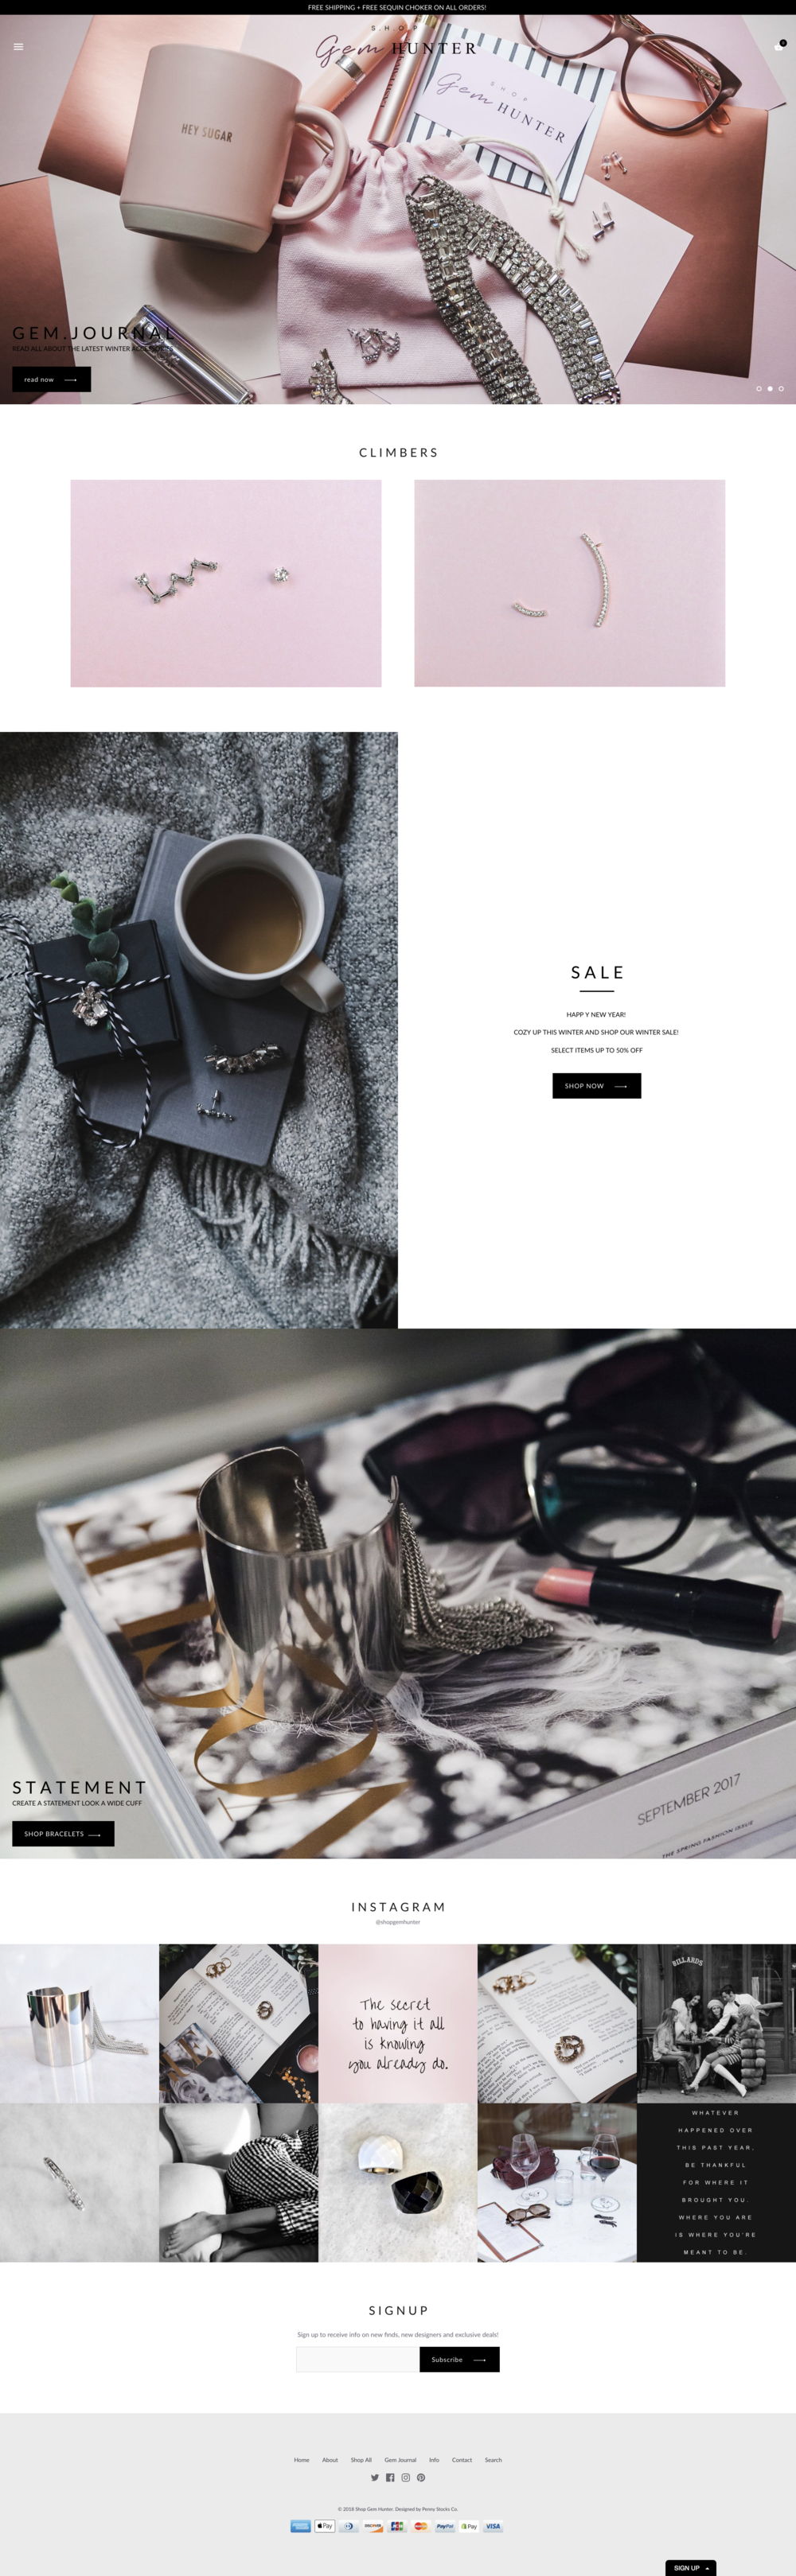 kristen-fulchi-design-studio-branding-photography-web-design-for-creatives-thoughtful-design-miami-brand-designer-for-creative-women-entrepreneurs-custom-shopify-squarespace-websites1